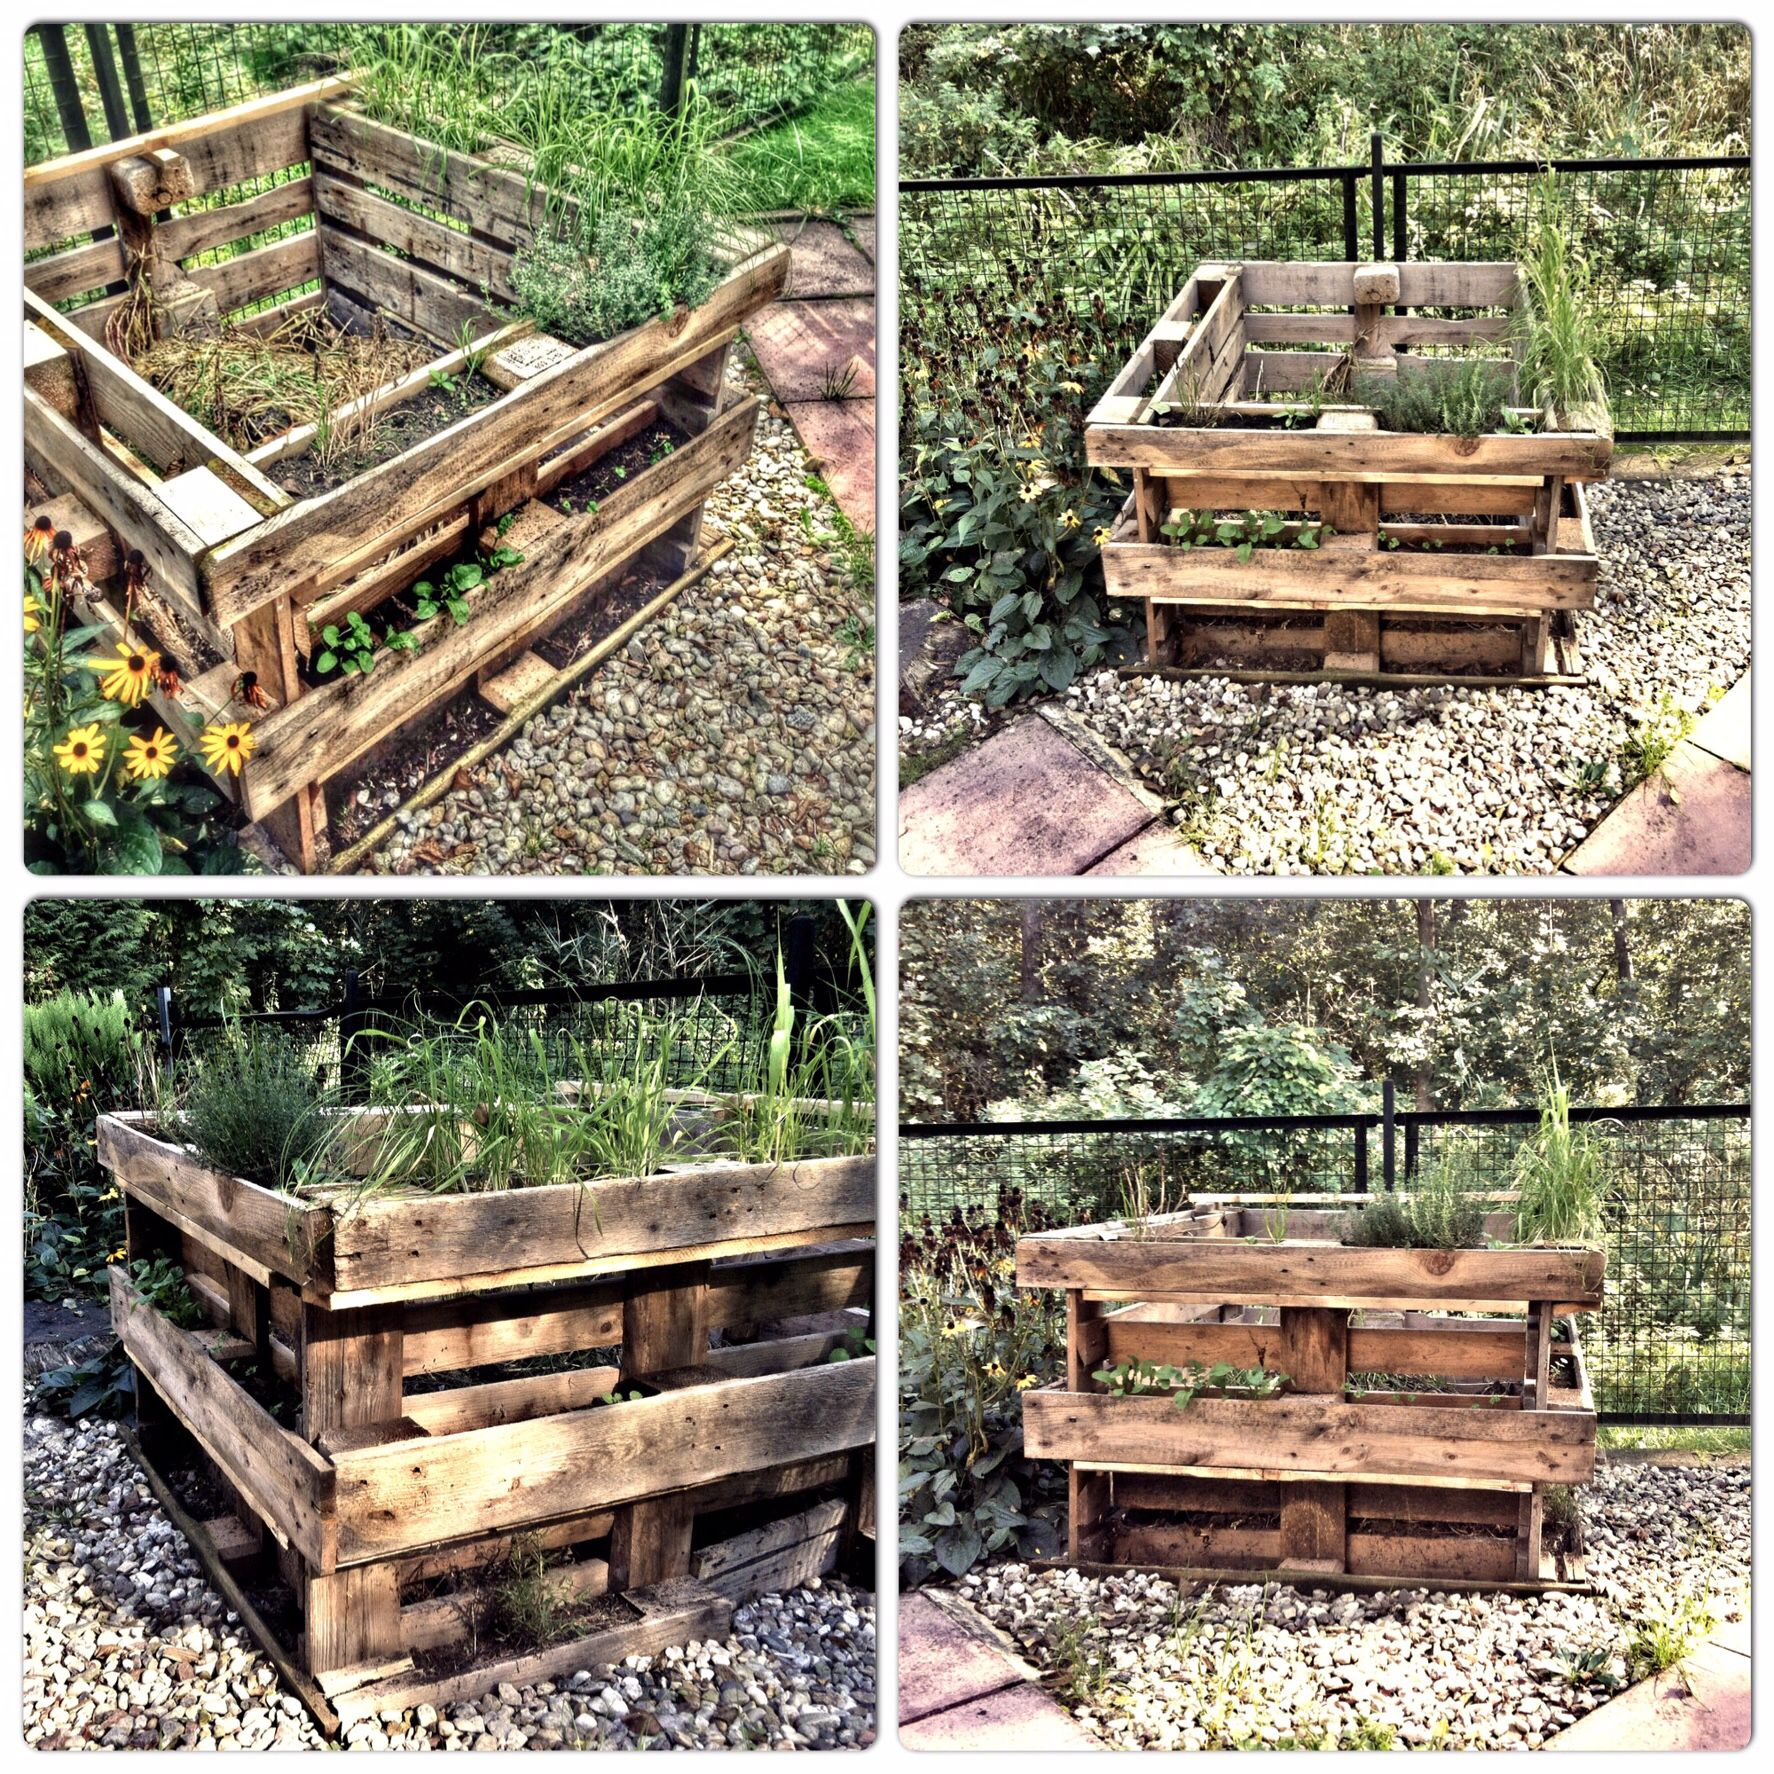 projekt kompost pallett projects pinterest kompost m bel aus paletten and garten. Black Bedroom Furniture Sets. Home Design Ideas